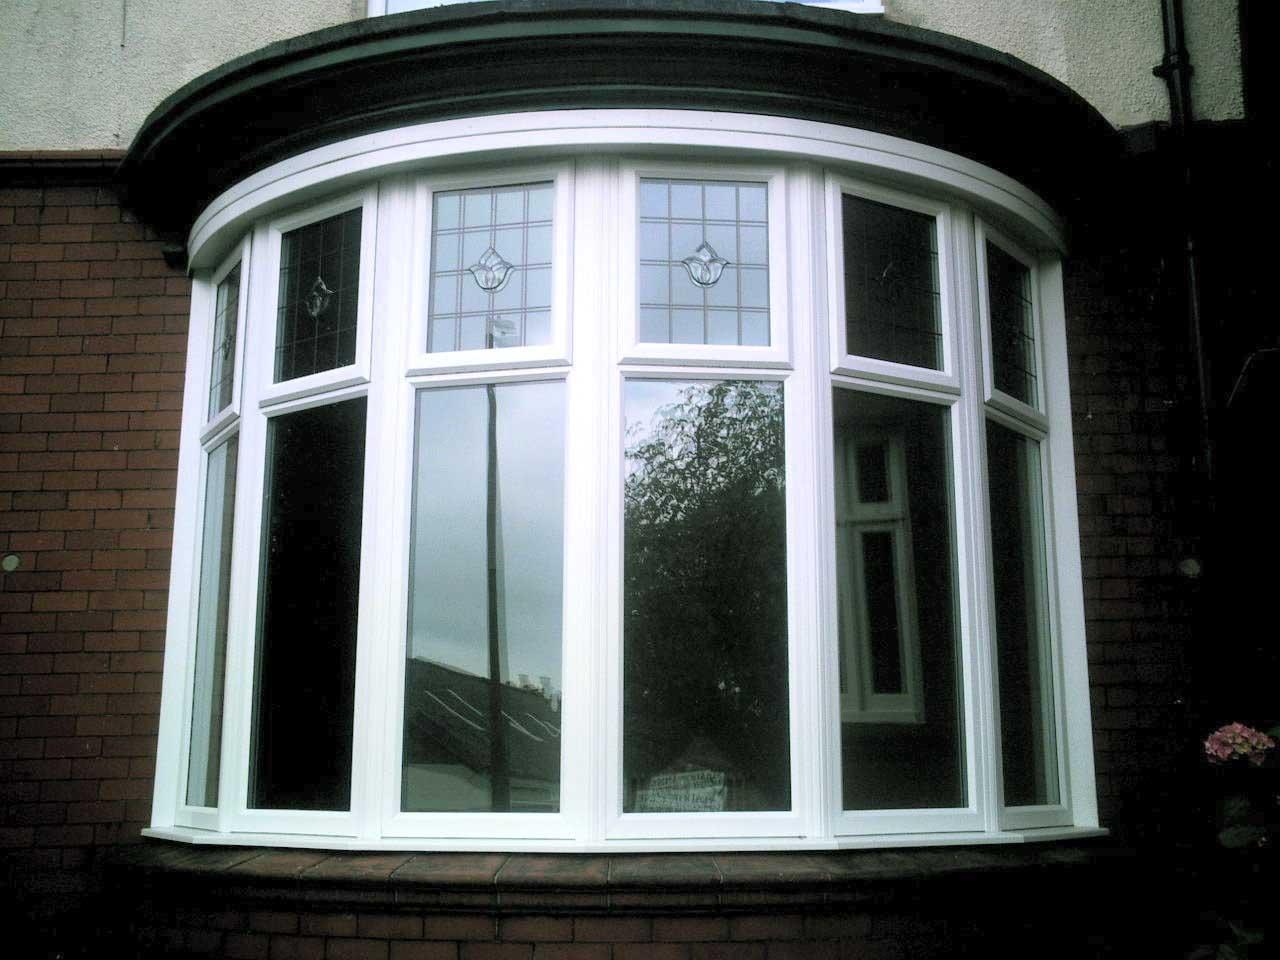 windows double glazing in northampton smart solutions. Black Bedroom Furniture Sets. Home Design Ideas